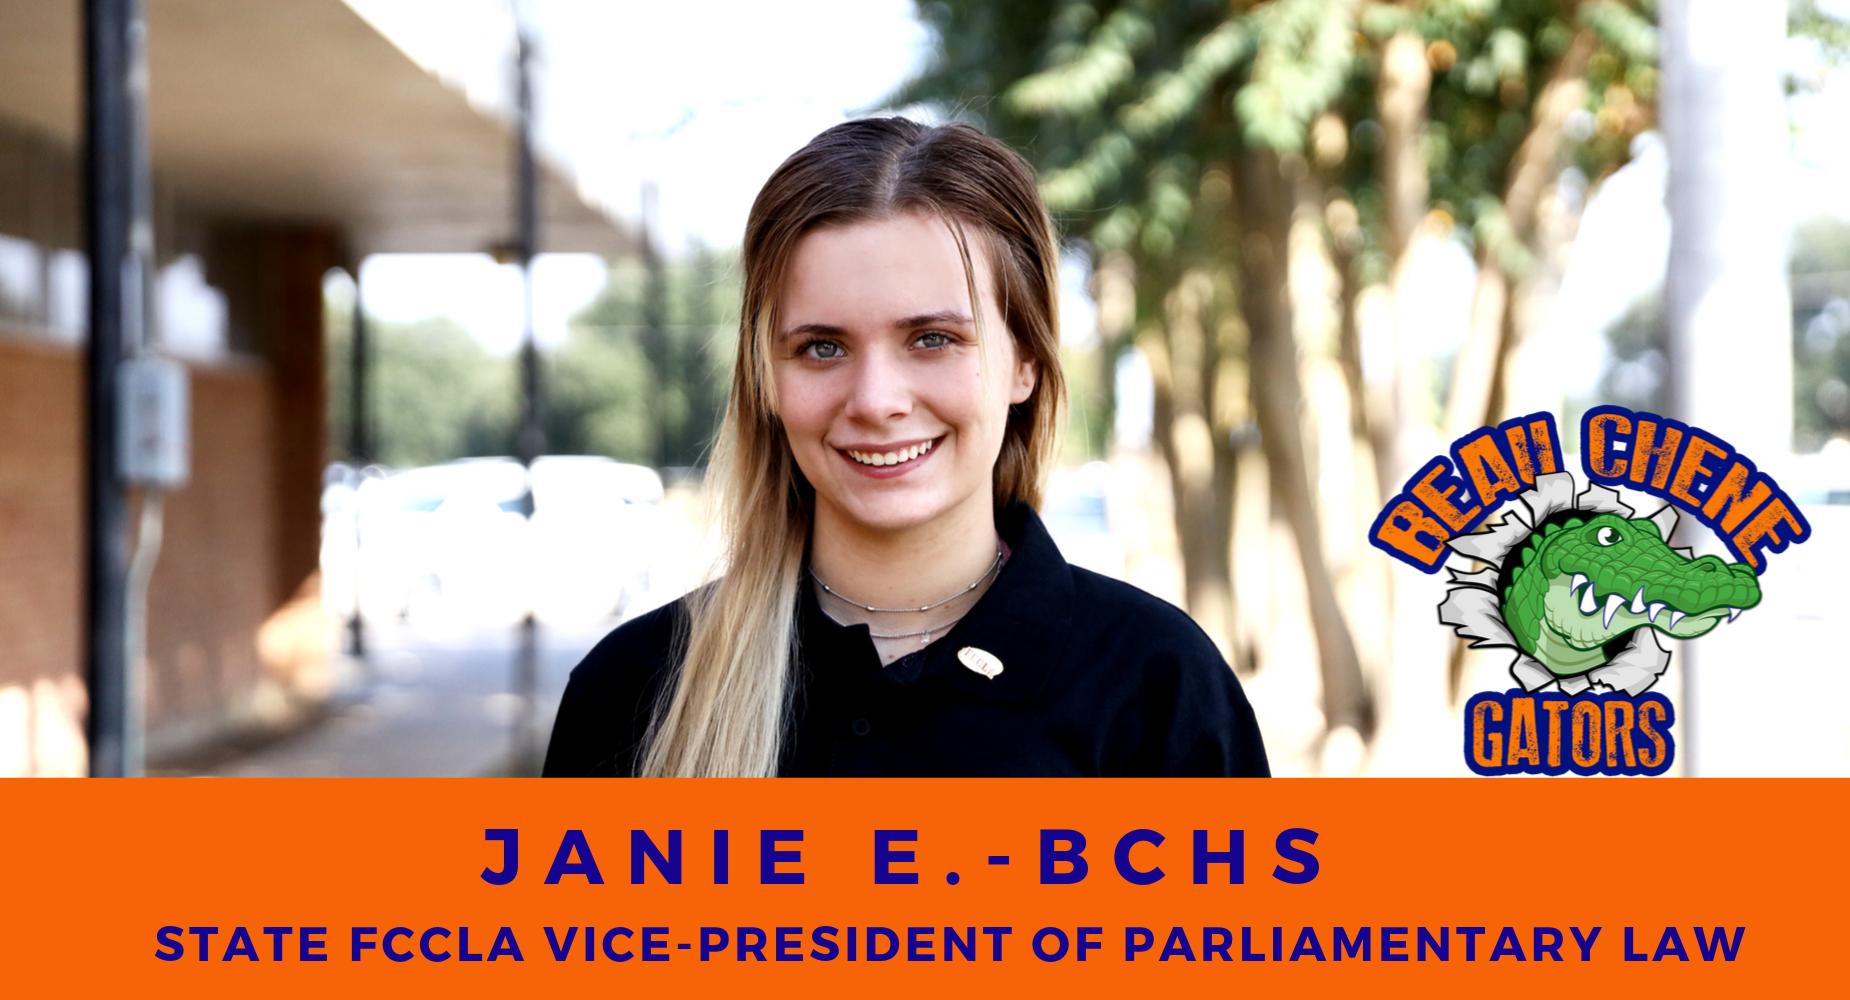 janie fccla vice president